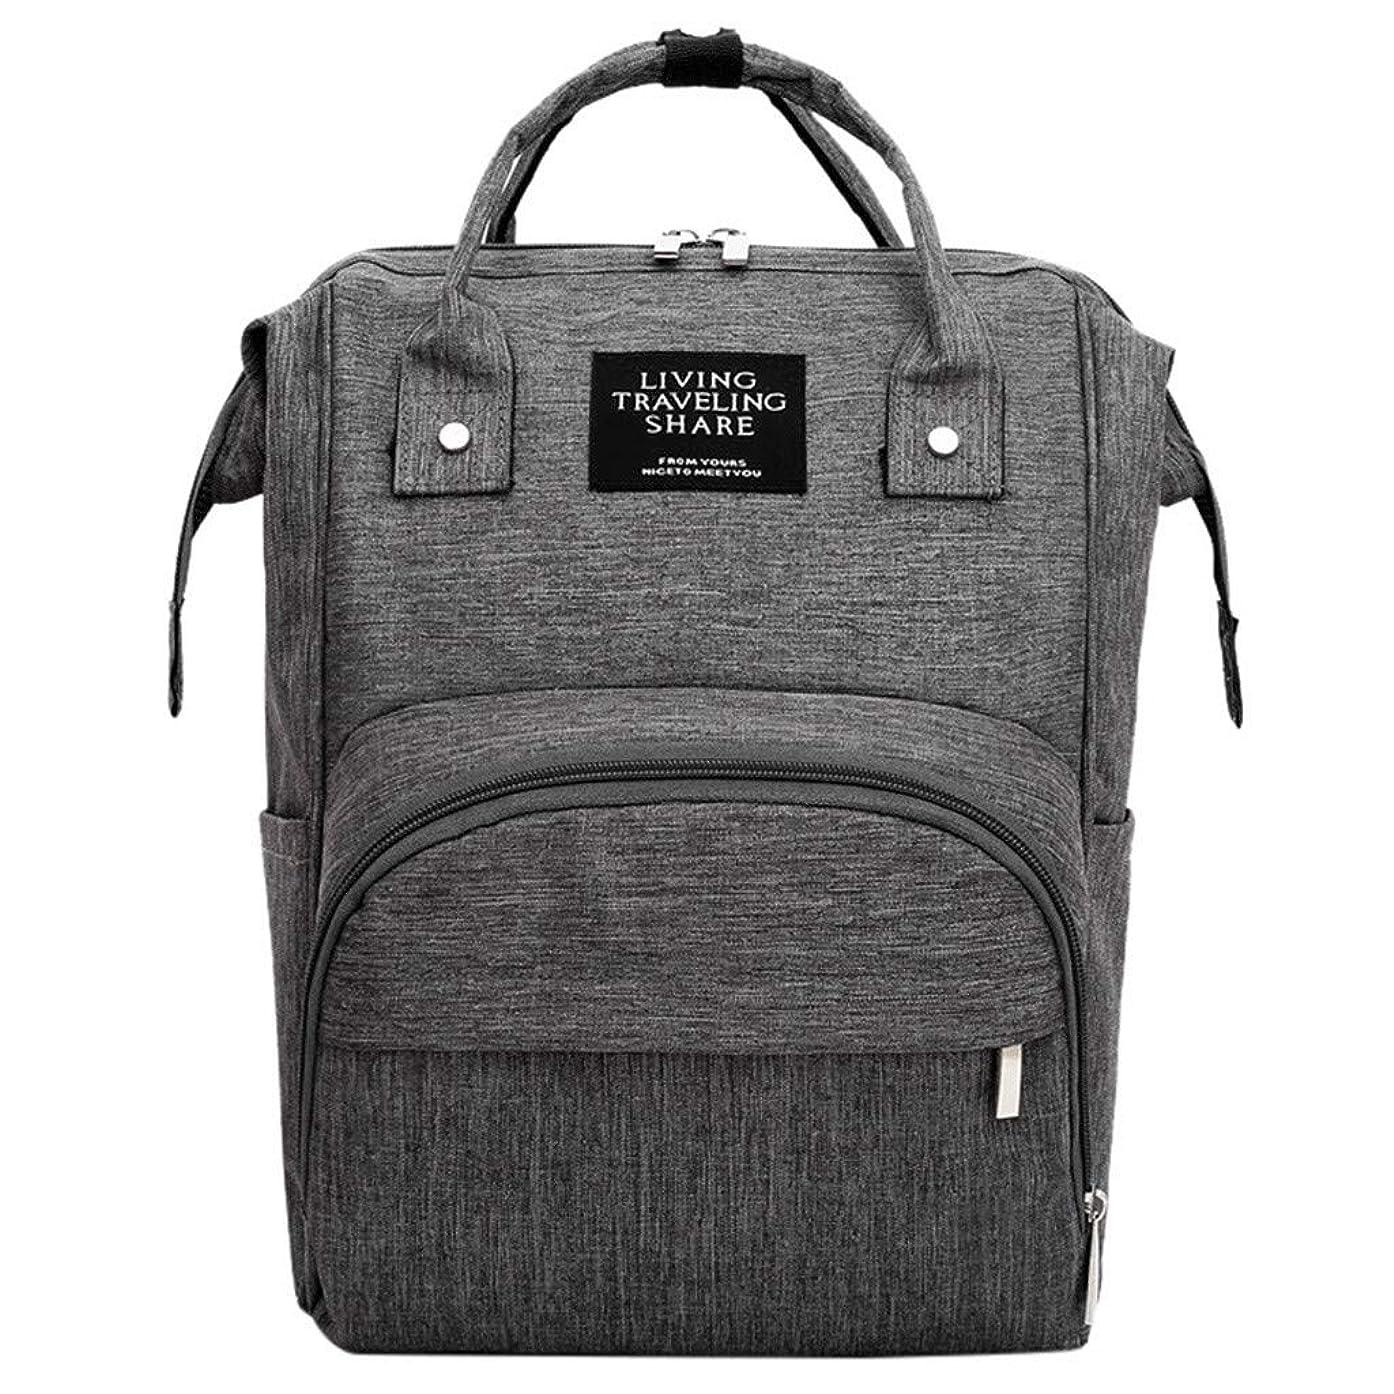 Goldweather Women Laptop Backpack Compartment Waterproof Oxford Rucksack Lightweight Anti-Theft Zipper Travel School Shoulder Bag Casual Daypack